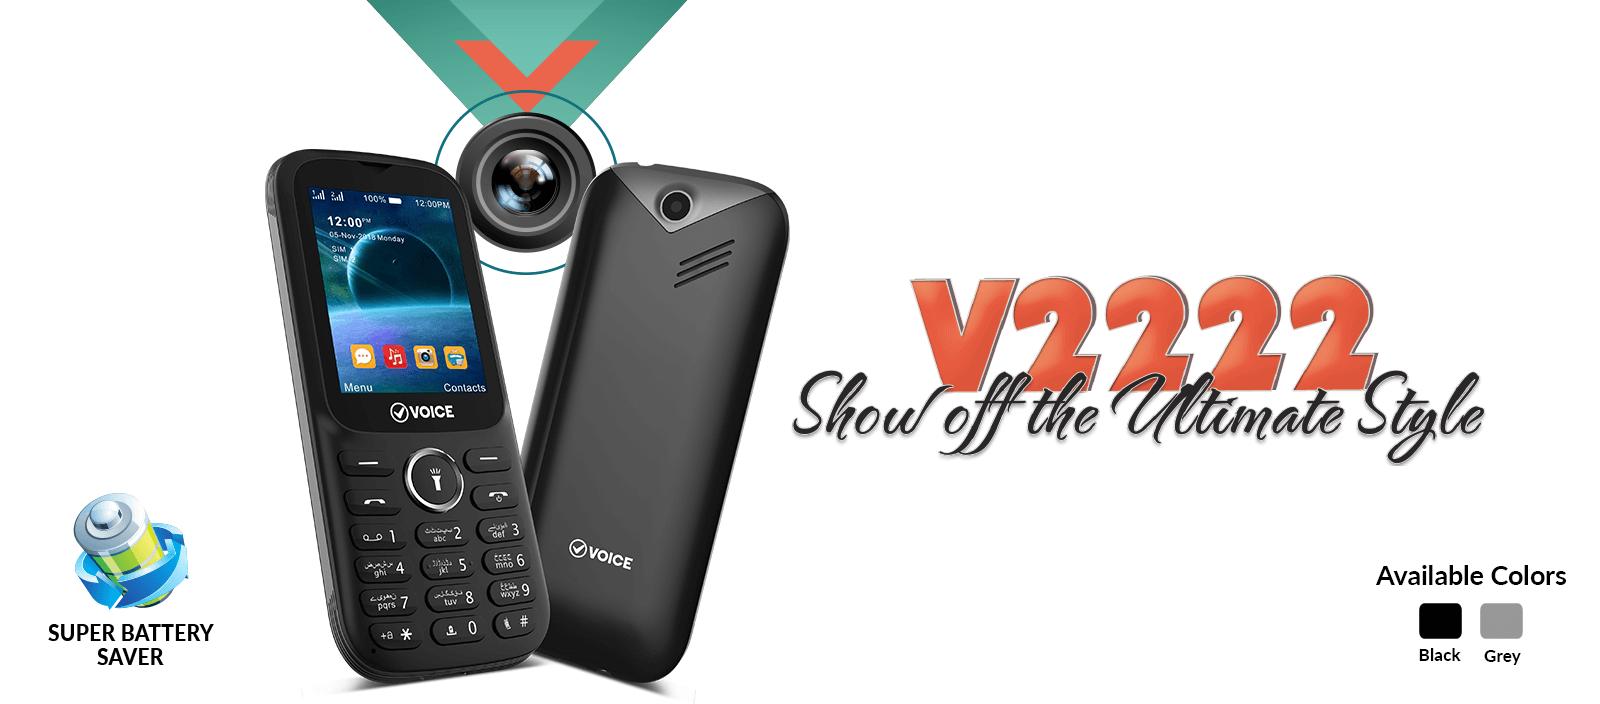 V2222